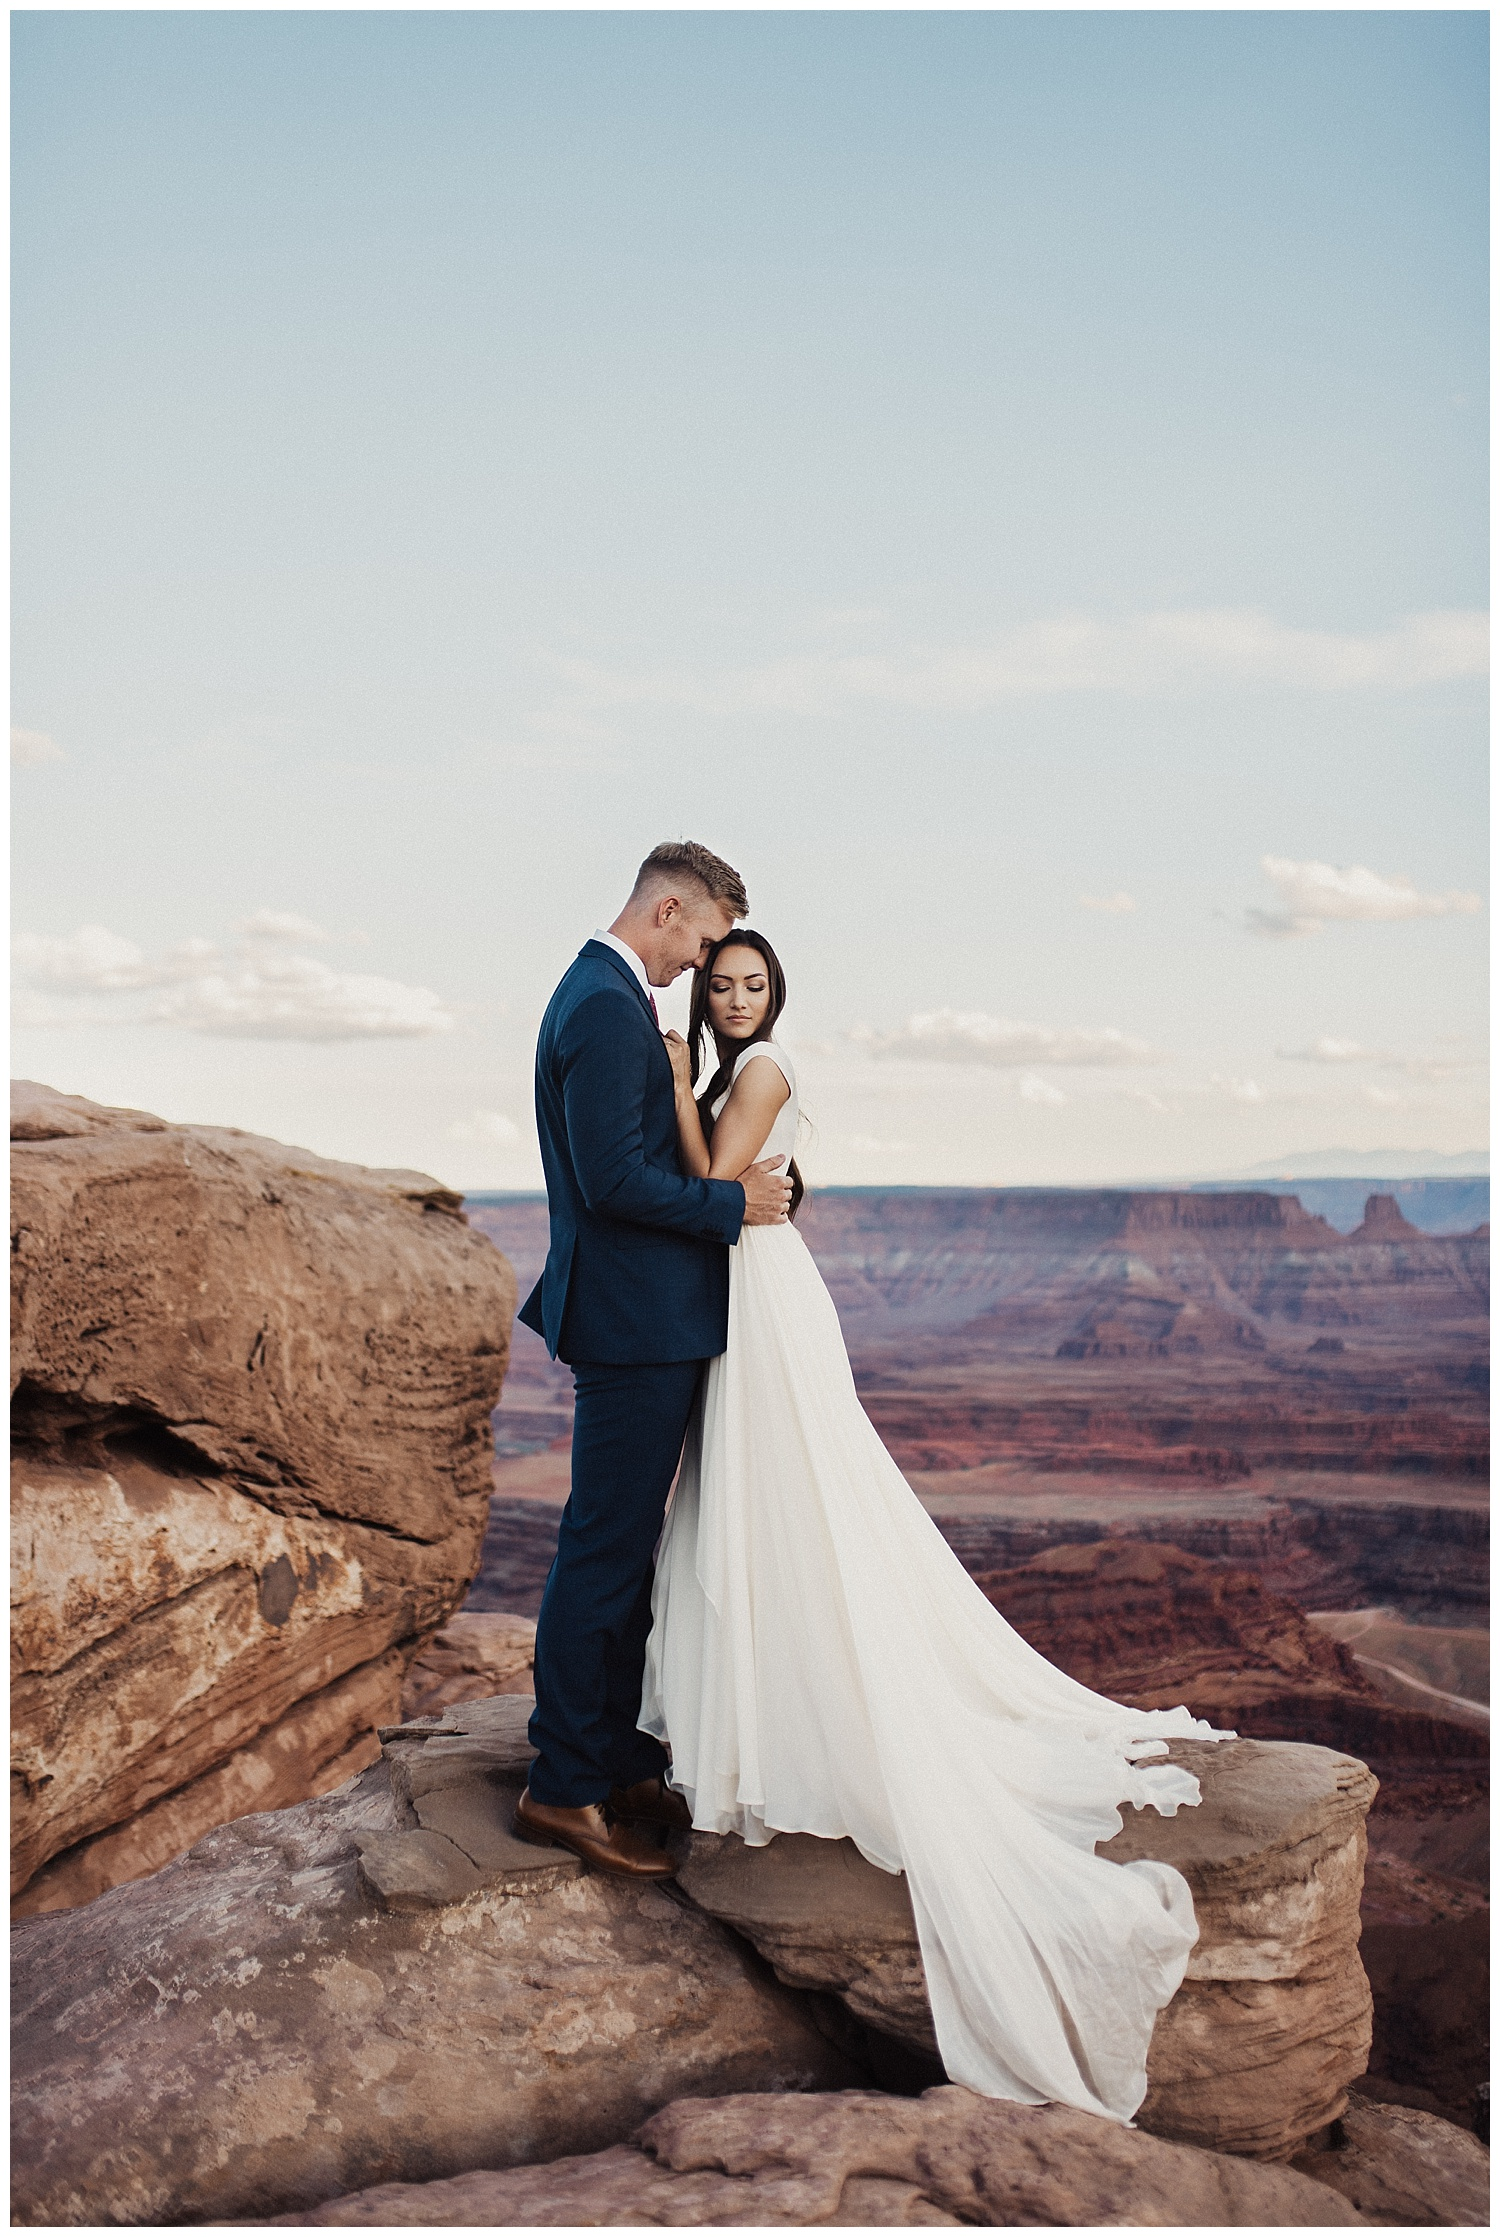 Wedding Bridals at Dead Horse Point